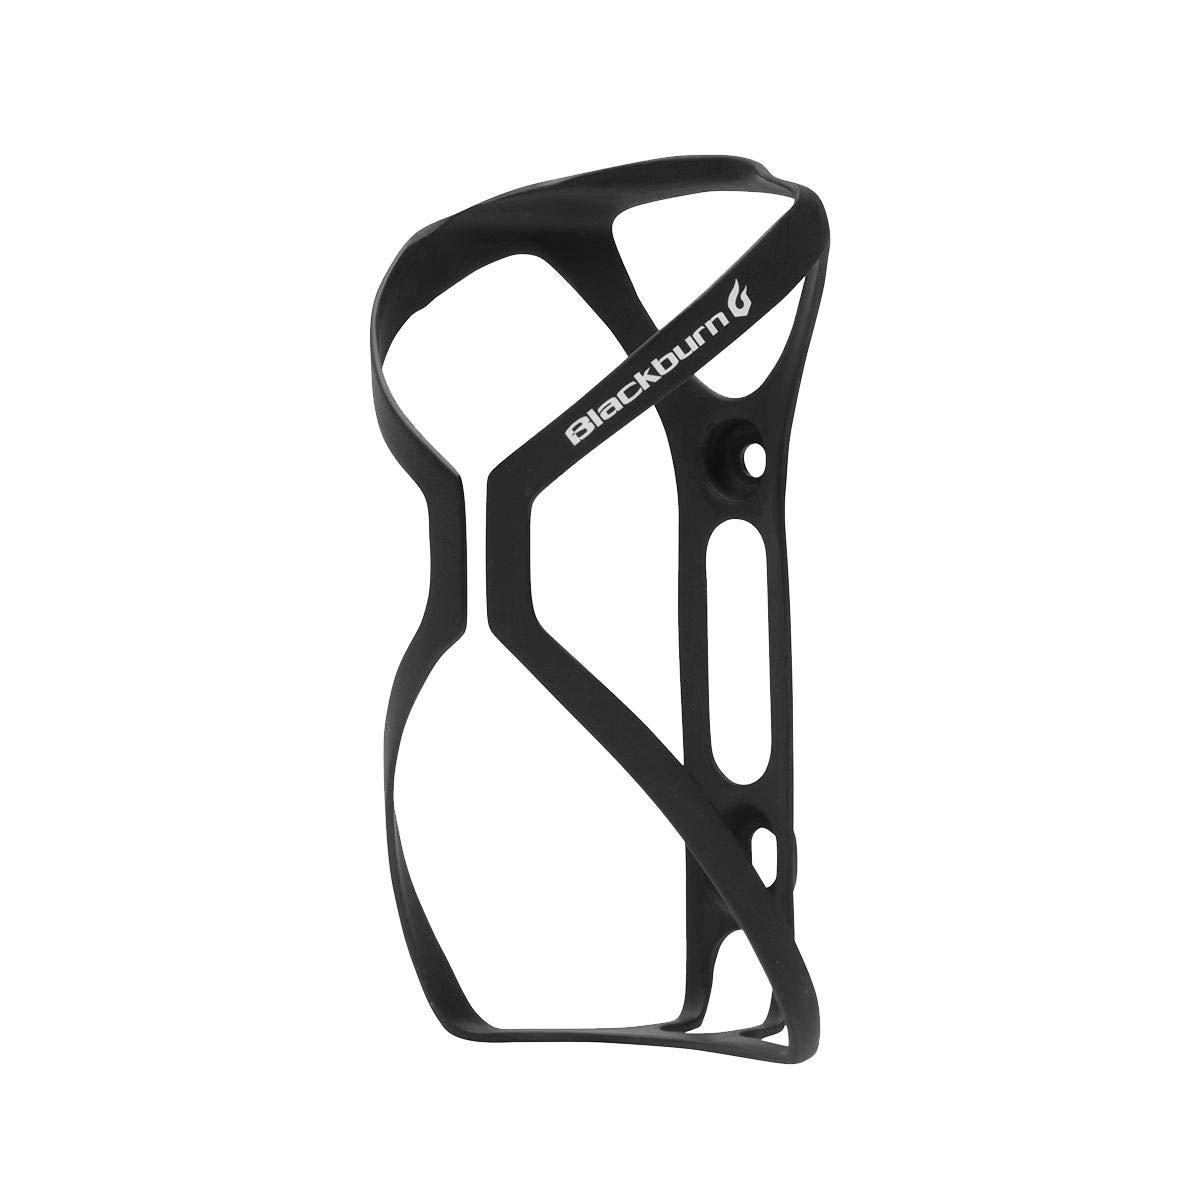 Blackburn Cinch Carbon Fiber Bottle Cage - Gloss Black by Blackburn